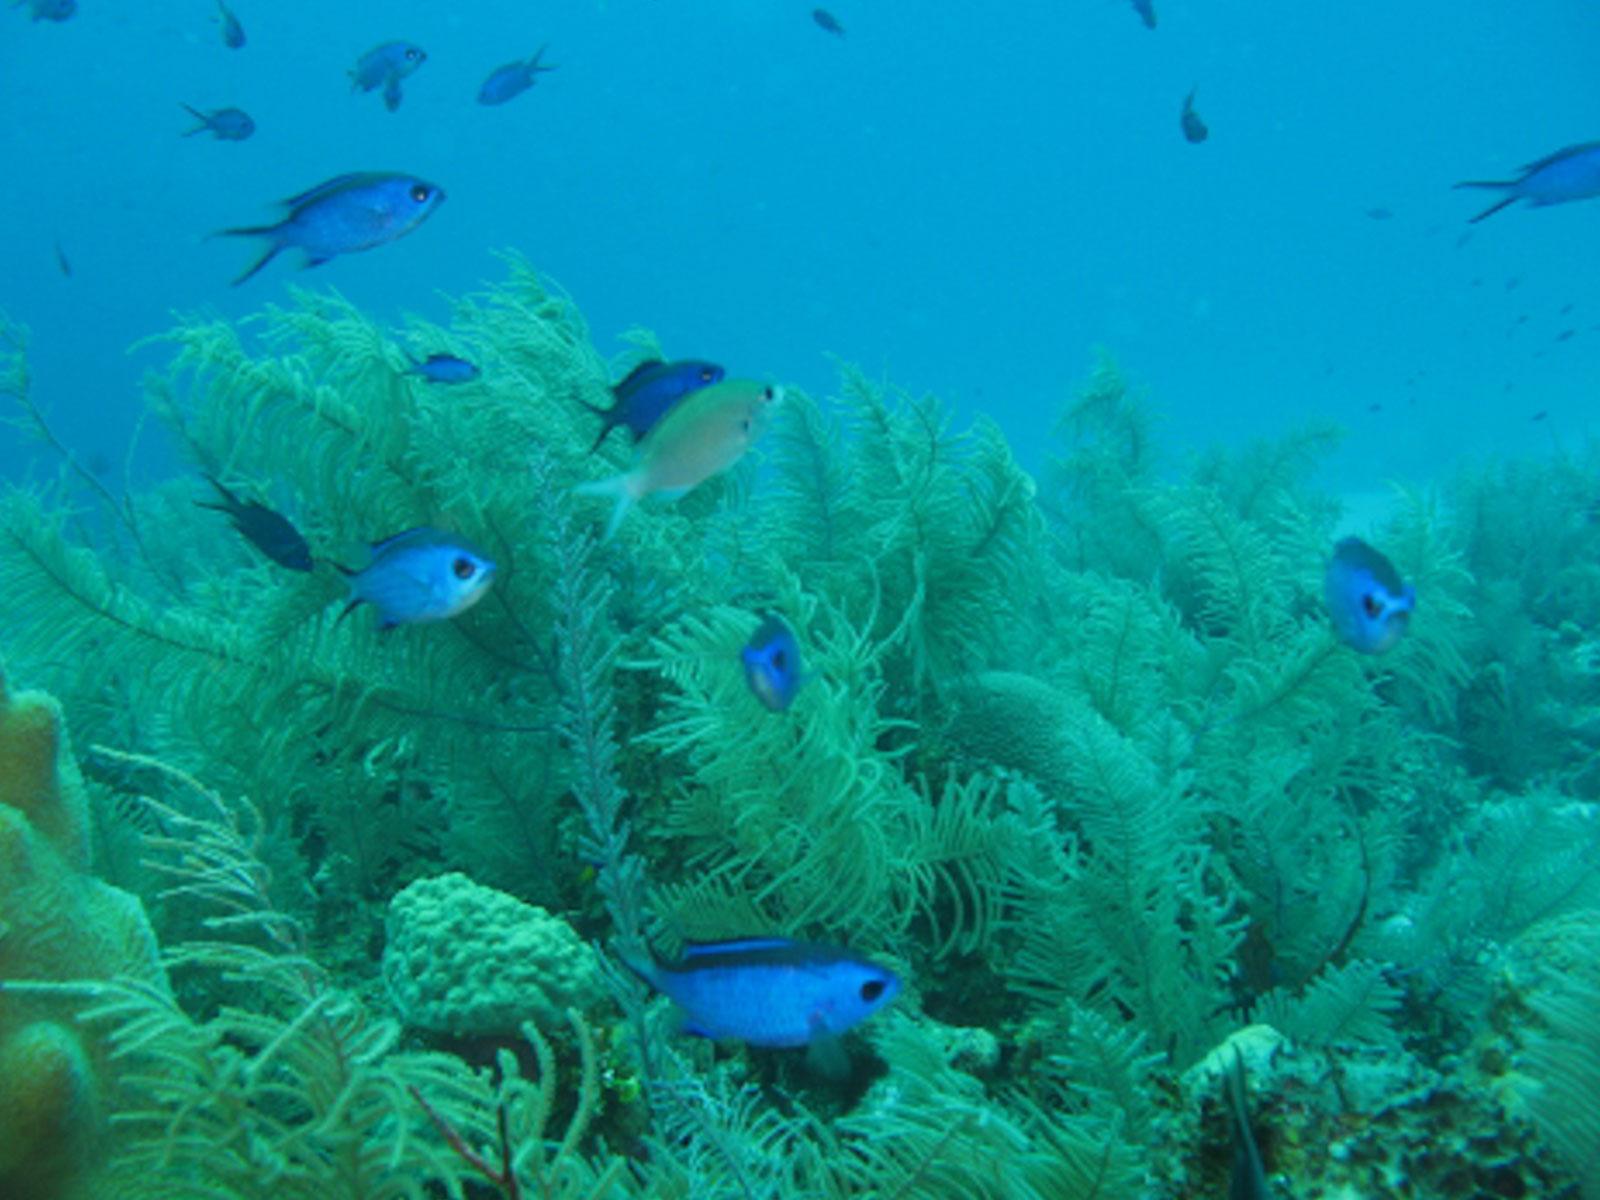 Reserva Seaflower 043 - OPMRP